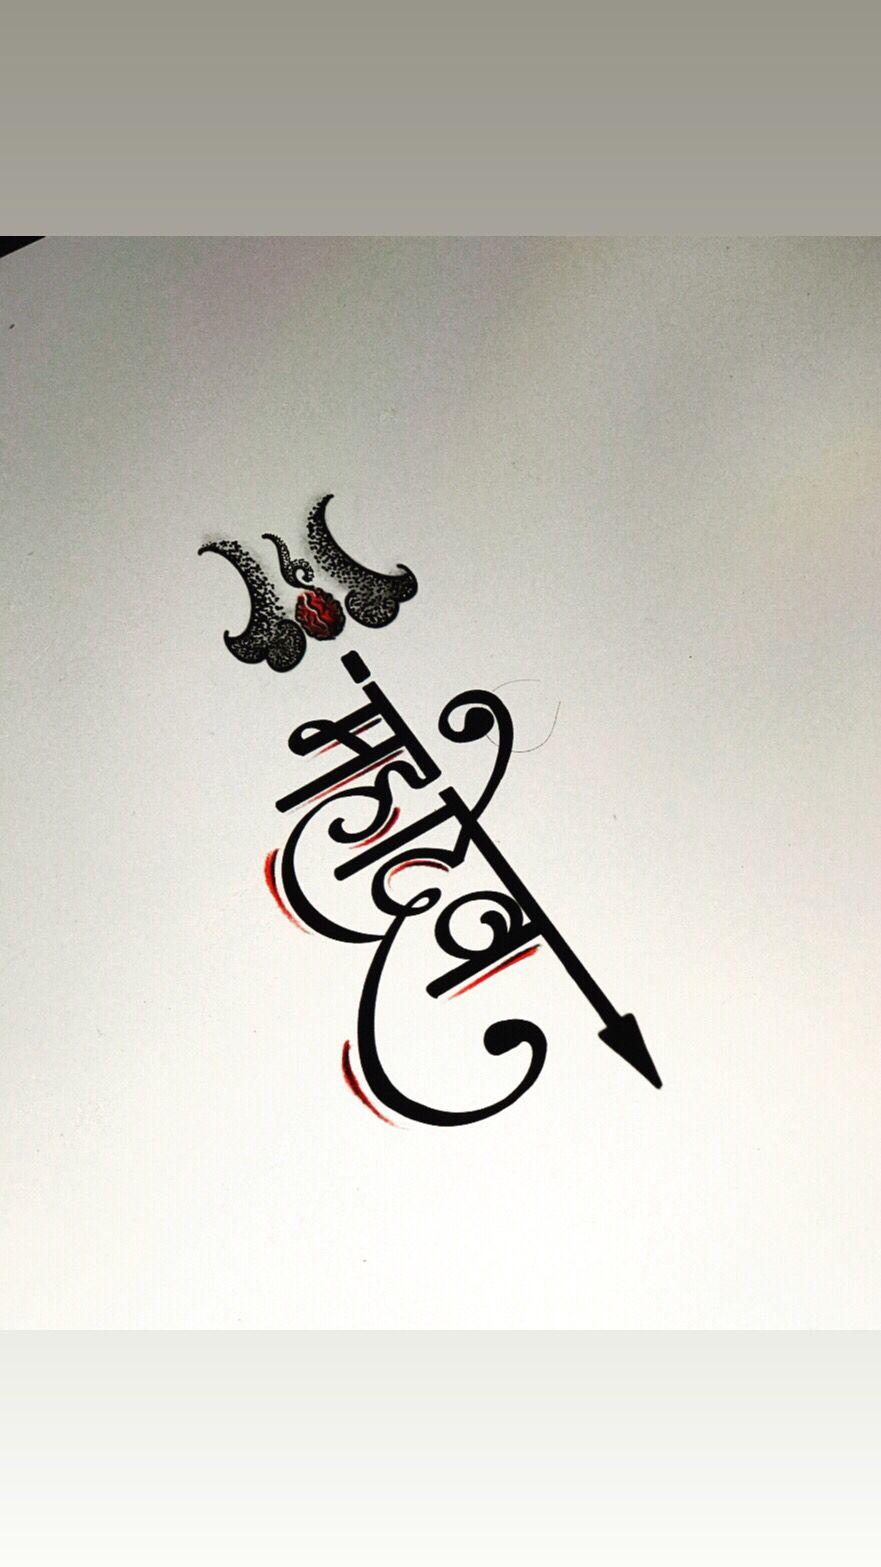 Trishul Tattoo Design Shiva Tattoo Design Trishul Tattoo Designs Shiva Tattoo